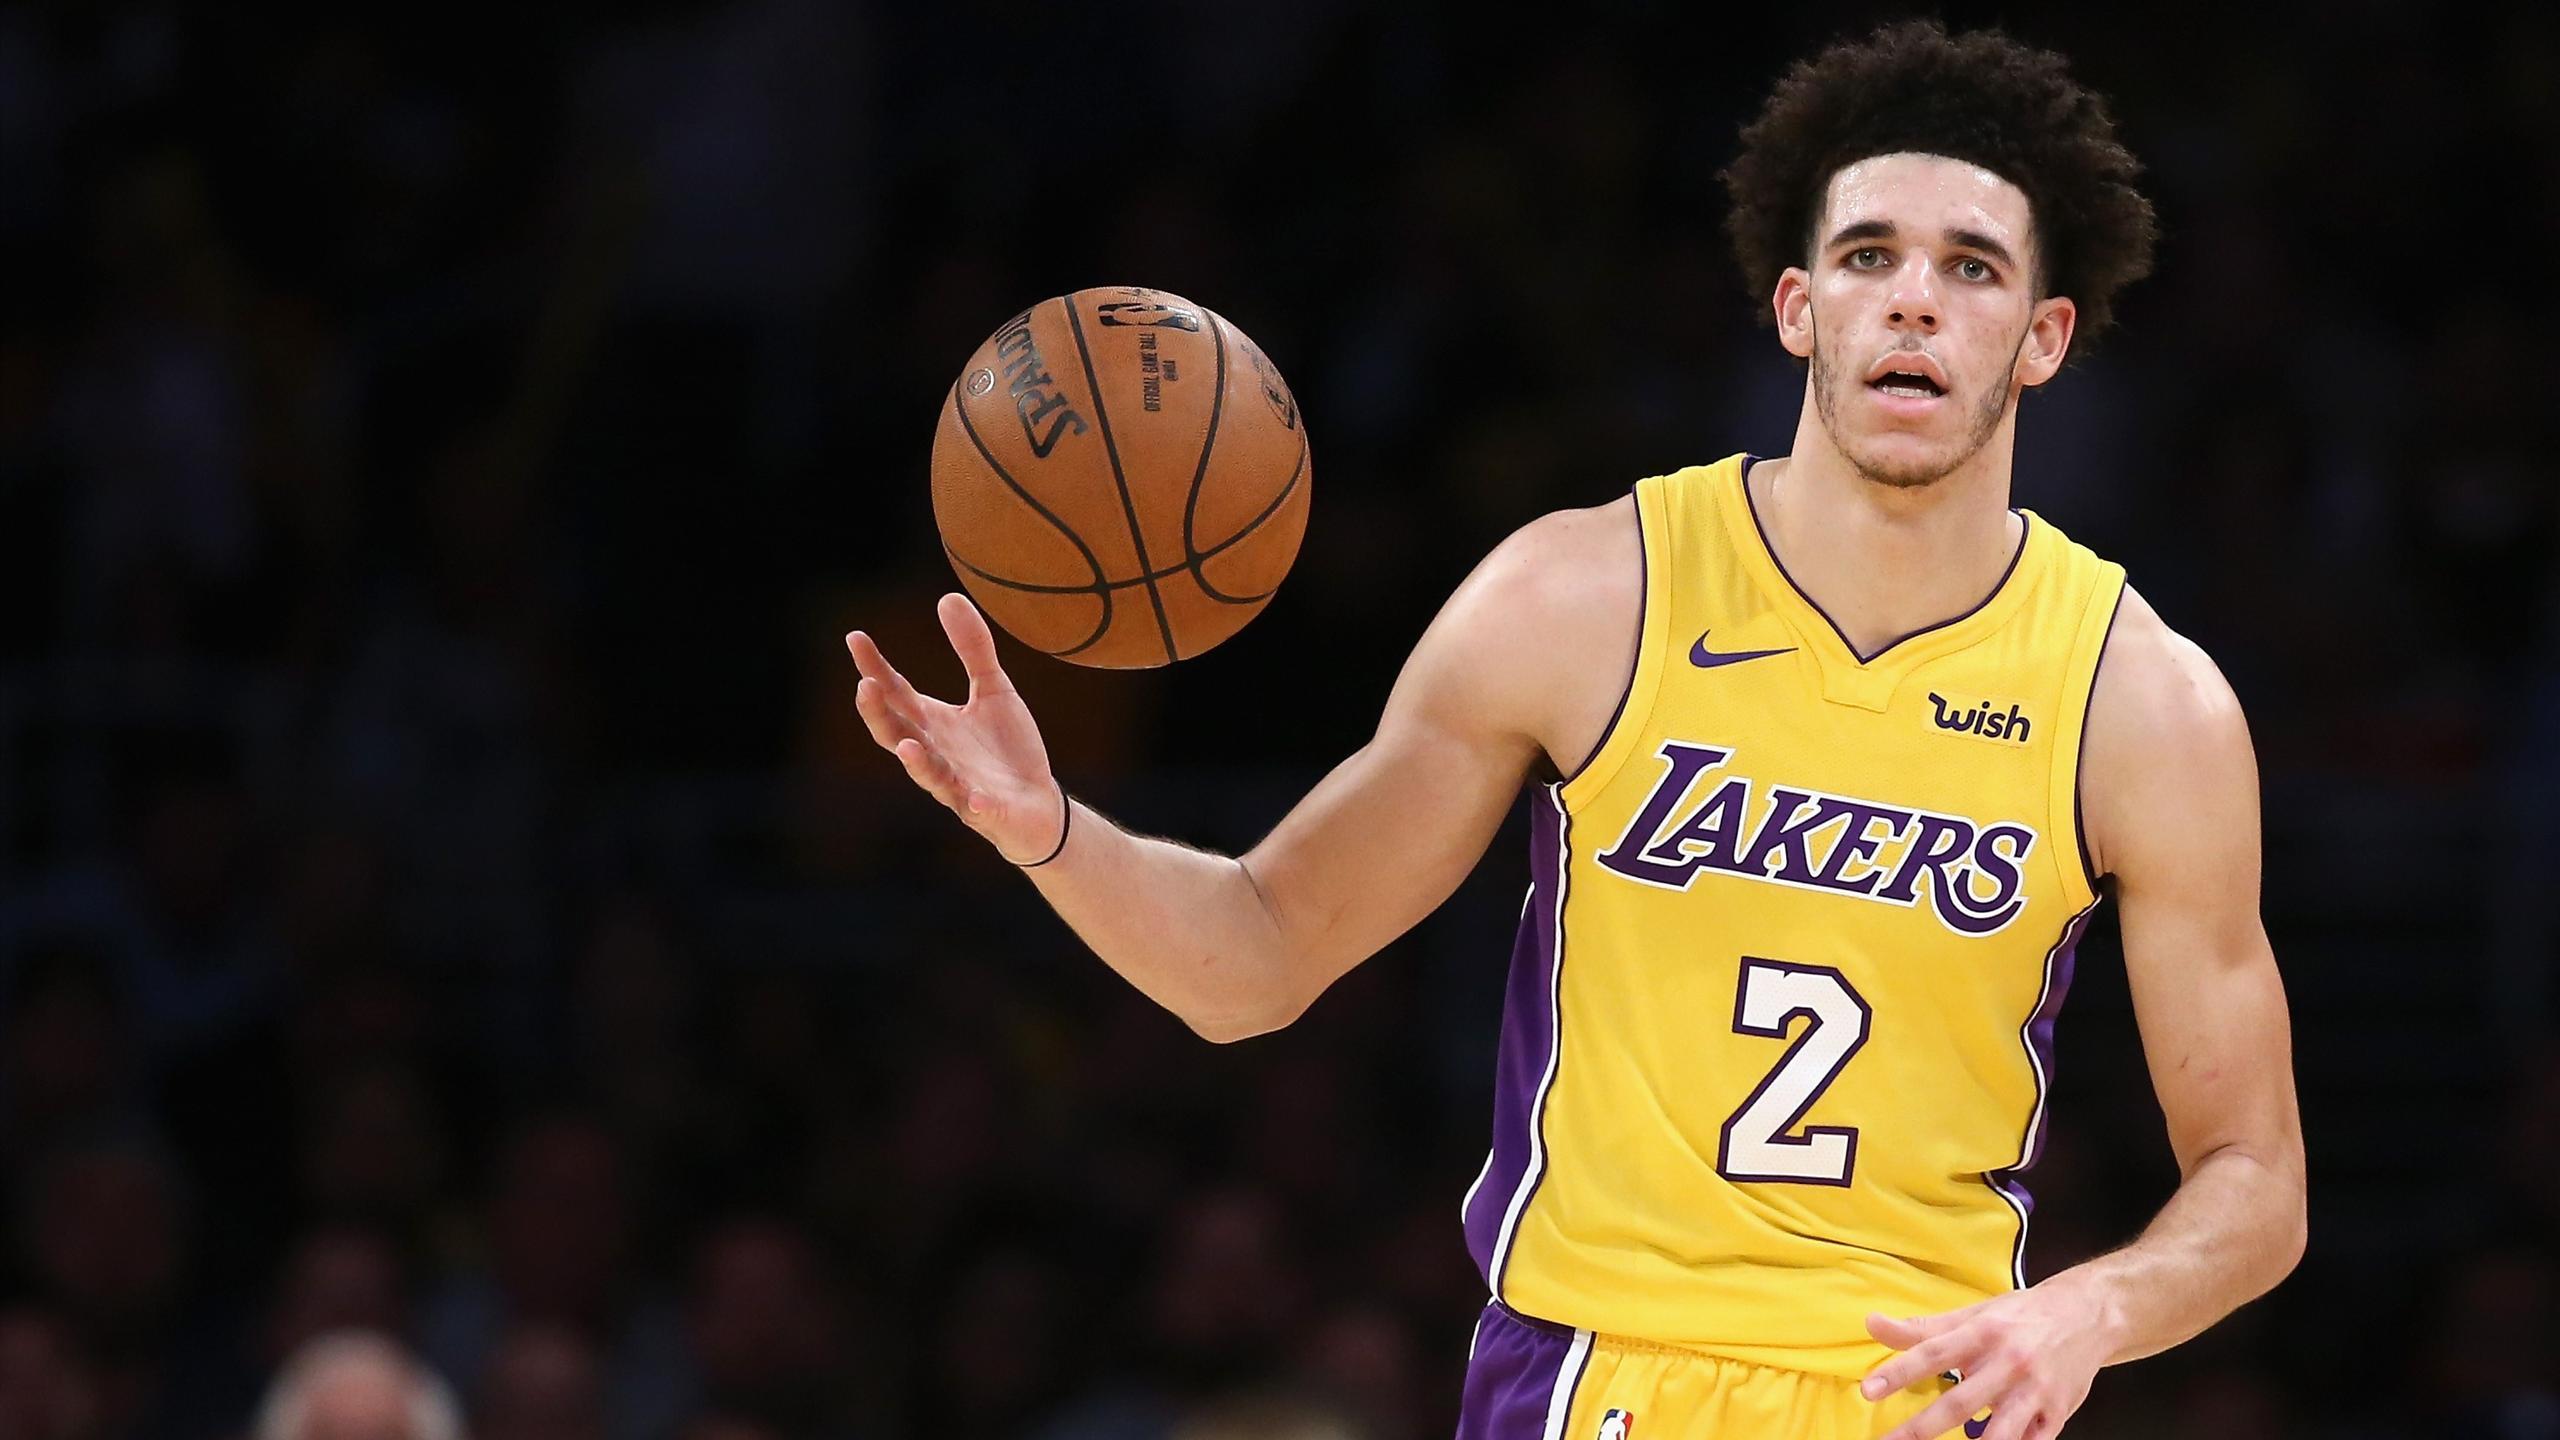 La nuova targata era dei Lakers targata nuova Lonzo Ball NBA 2017 2018 Basket   5bfb7d